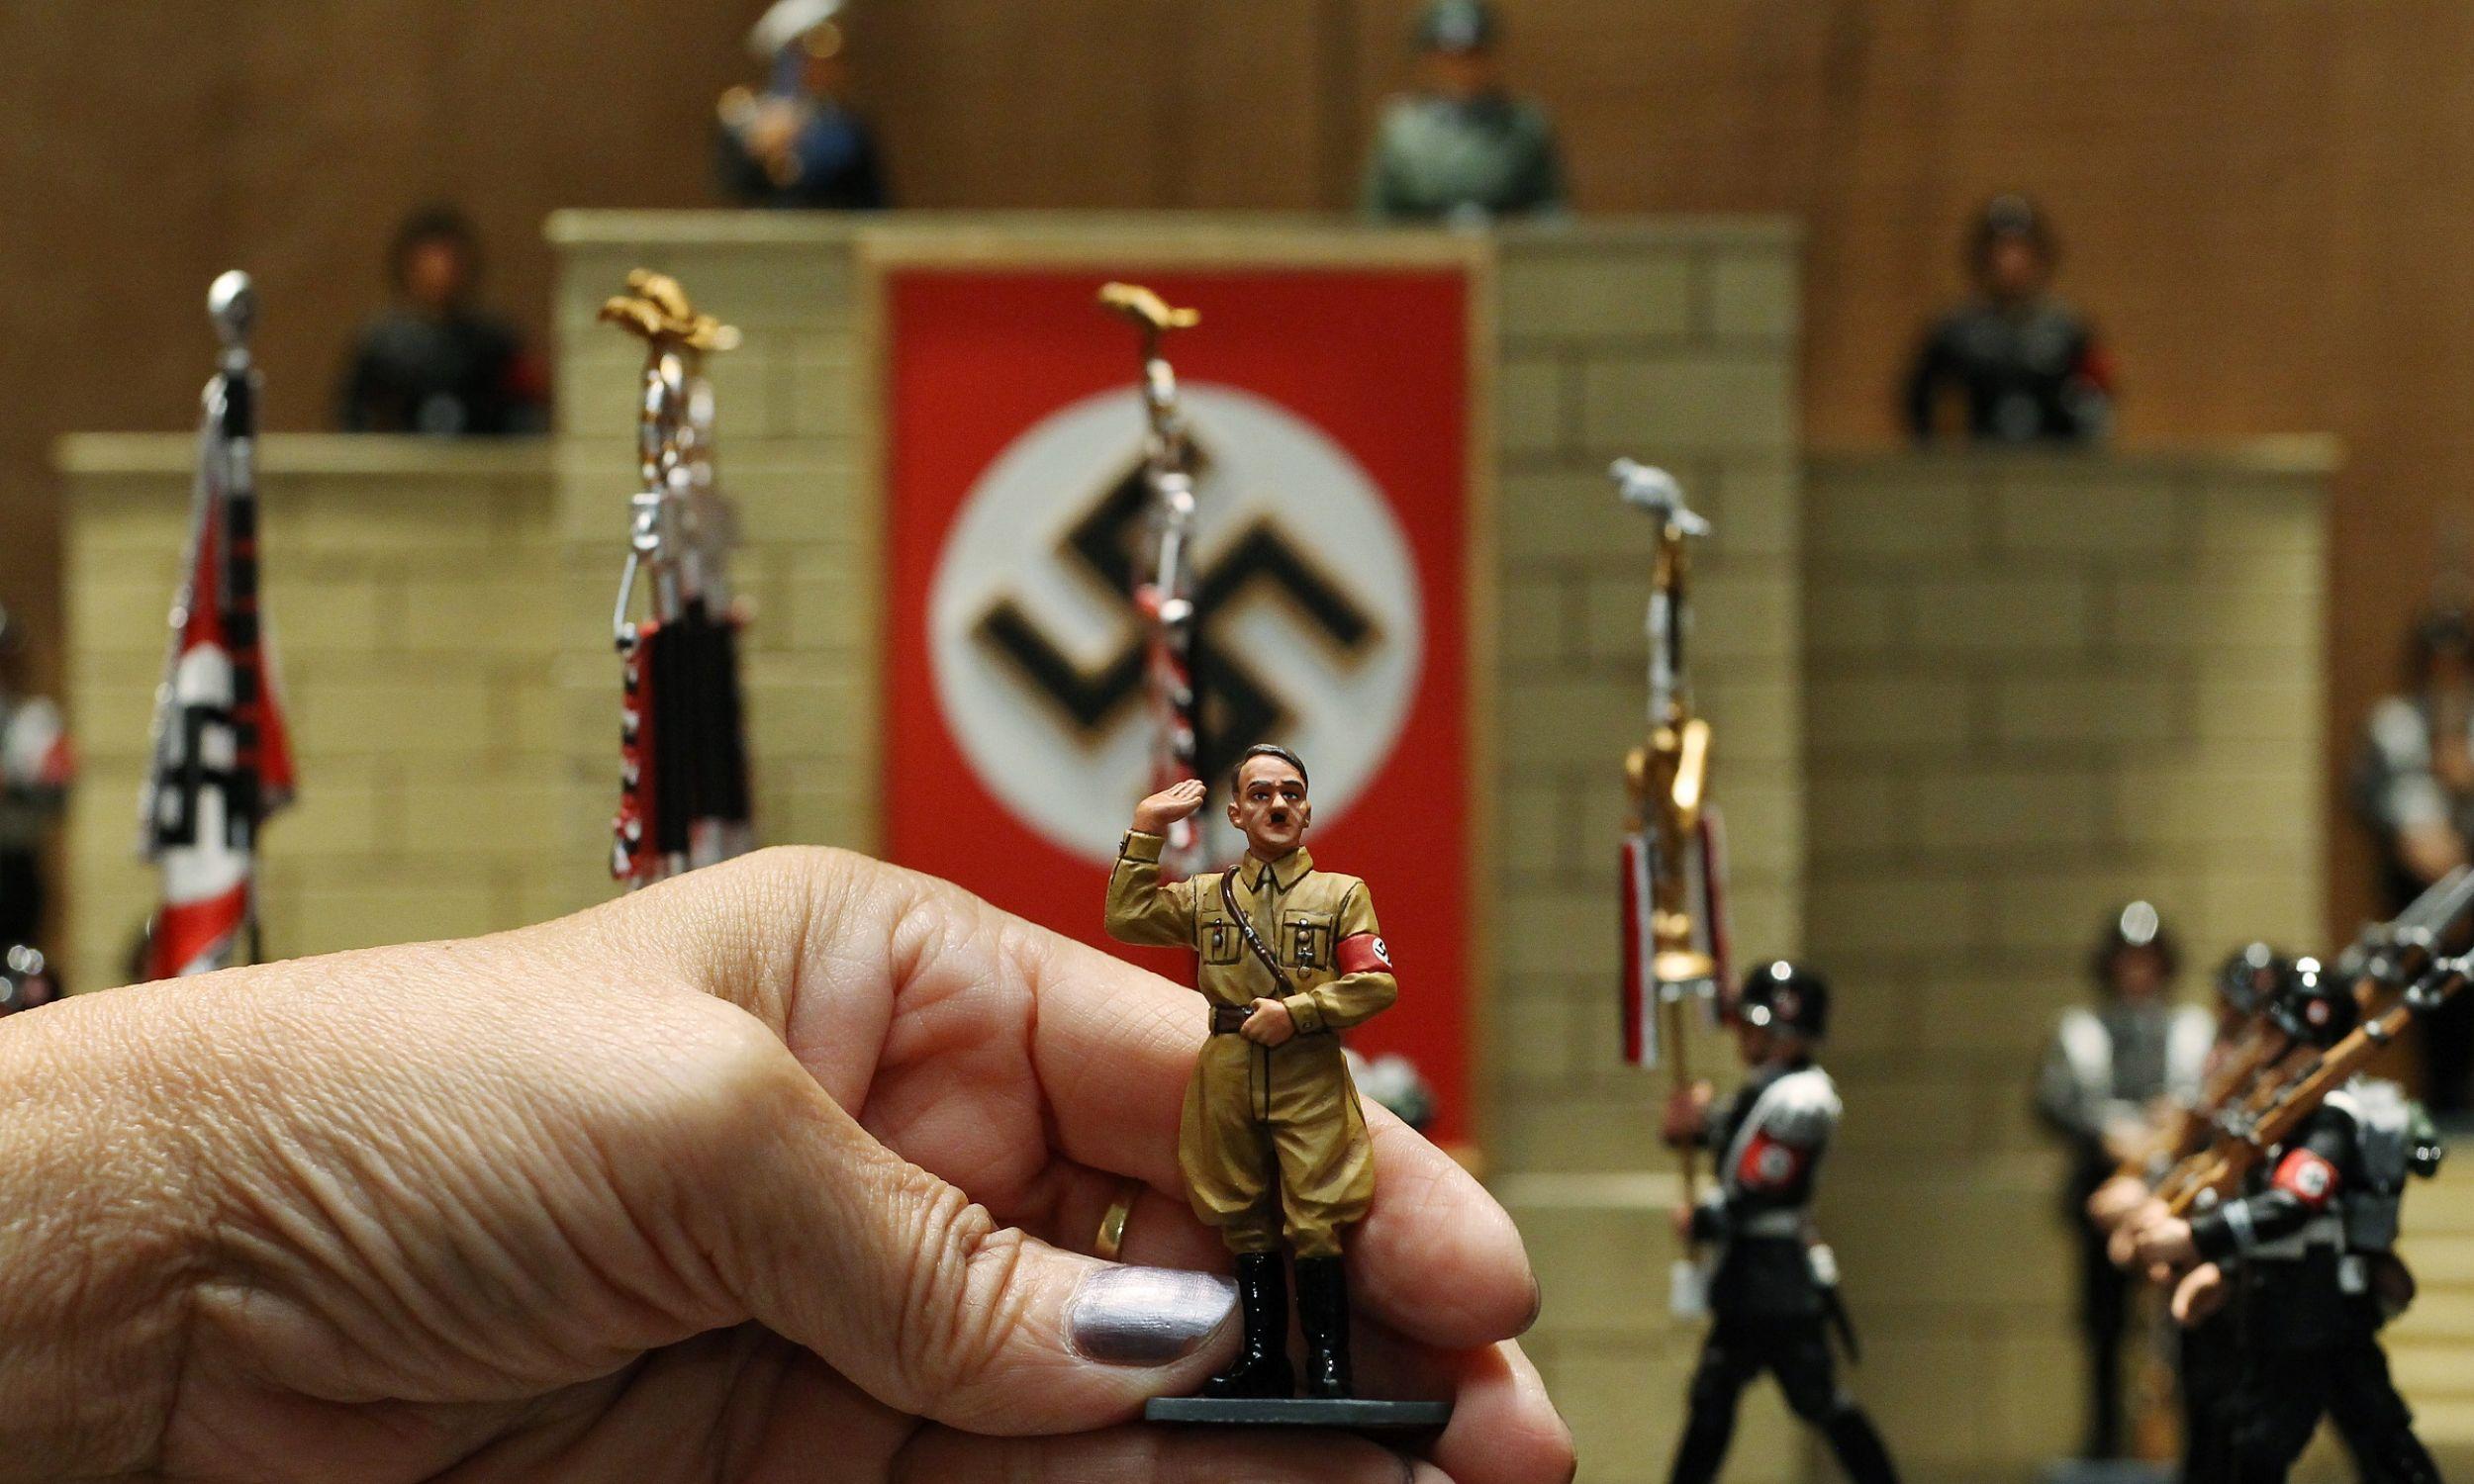 "Figurka Hitlera w sklepie kolekcjonerskim ""Kings & Country"" w centrum handlowym Pacific Place w Hongkongu. Fot. Felix Wong / South China Morning Post za pośrednictwem Getty Images"